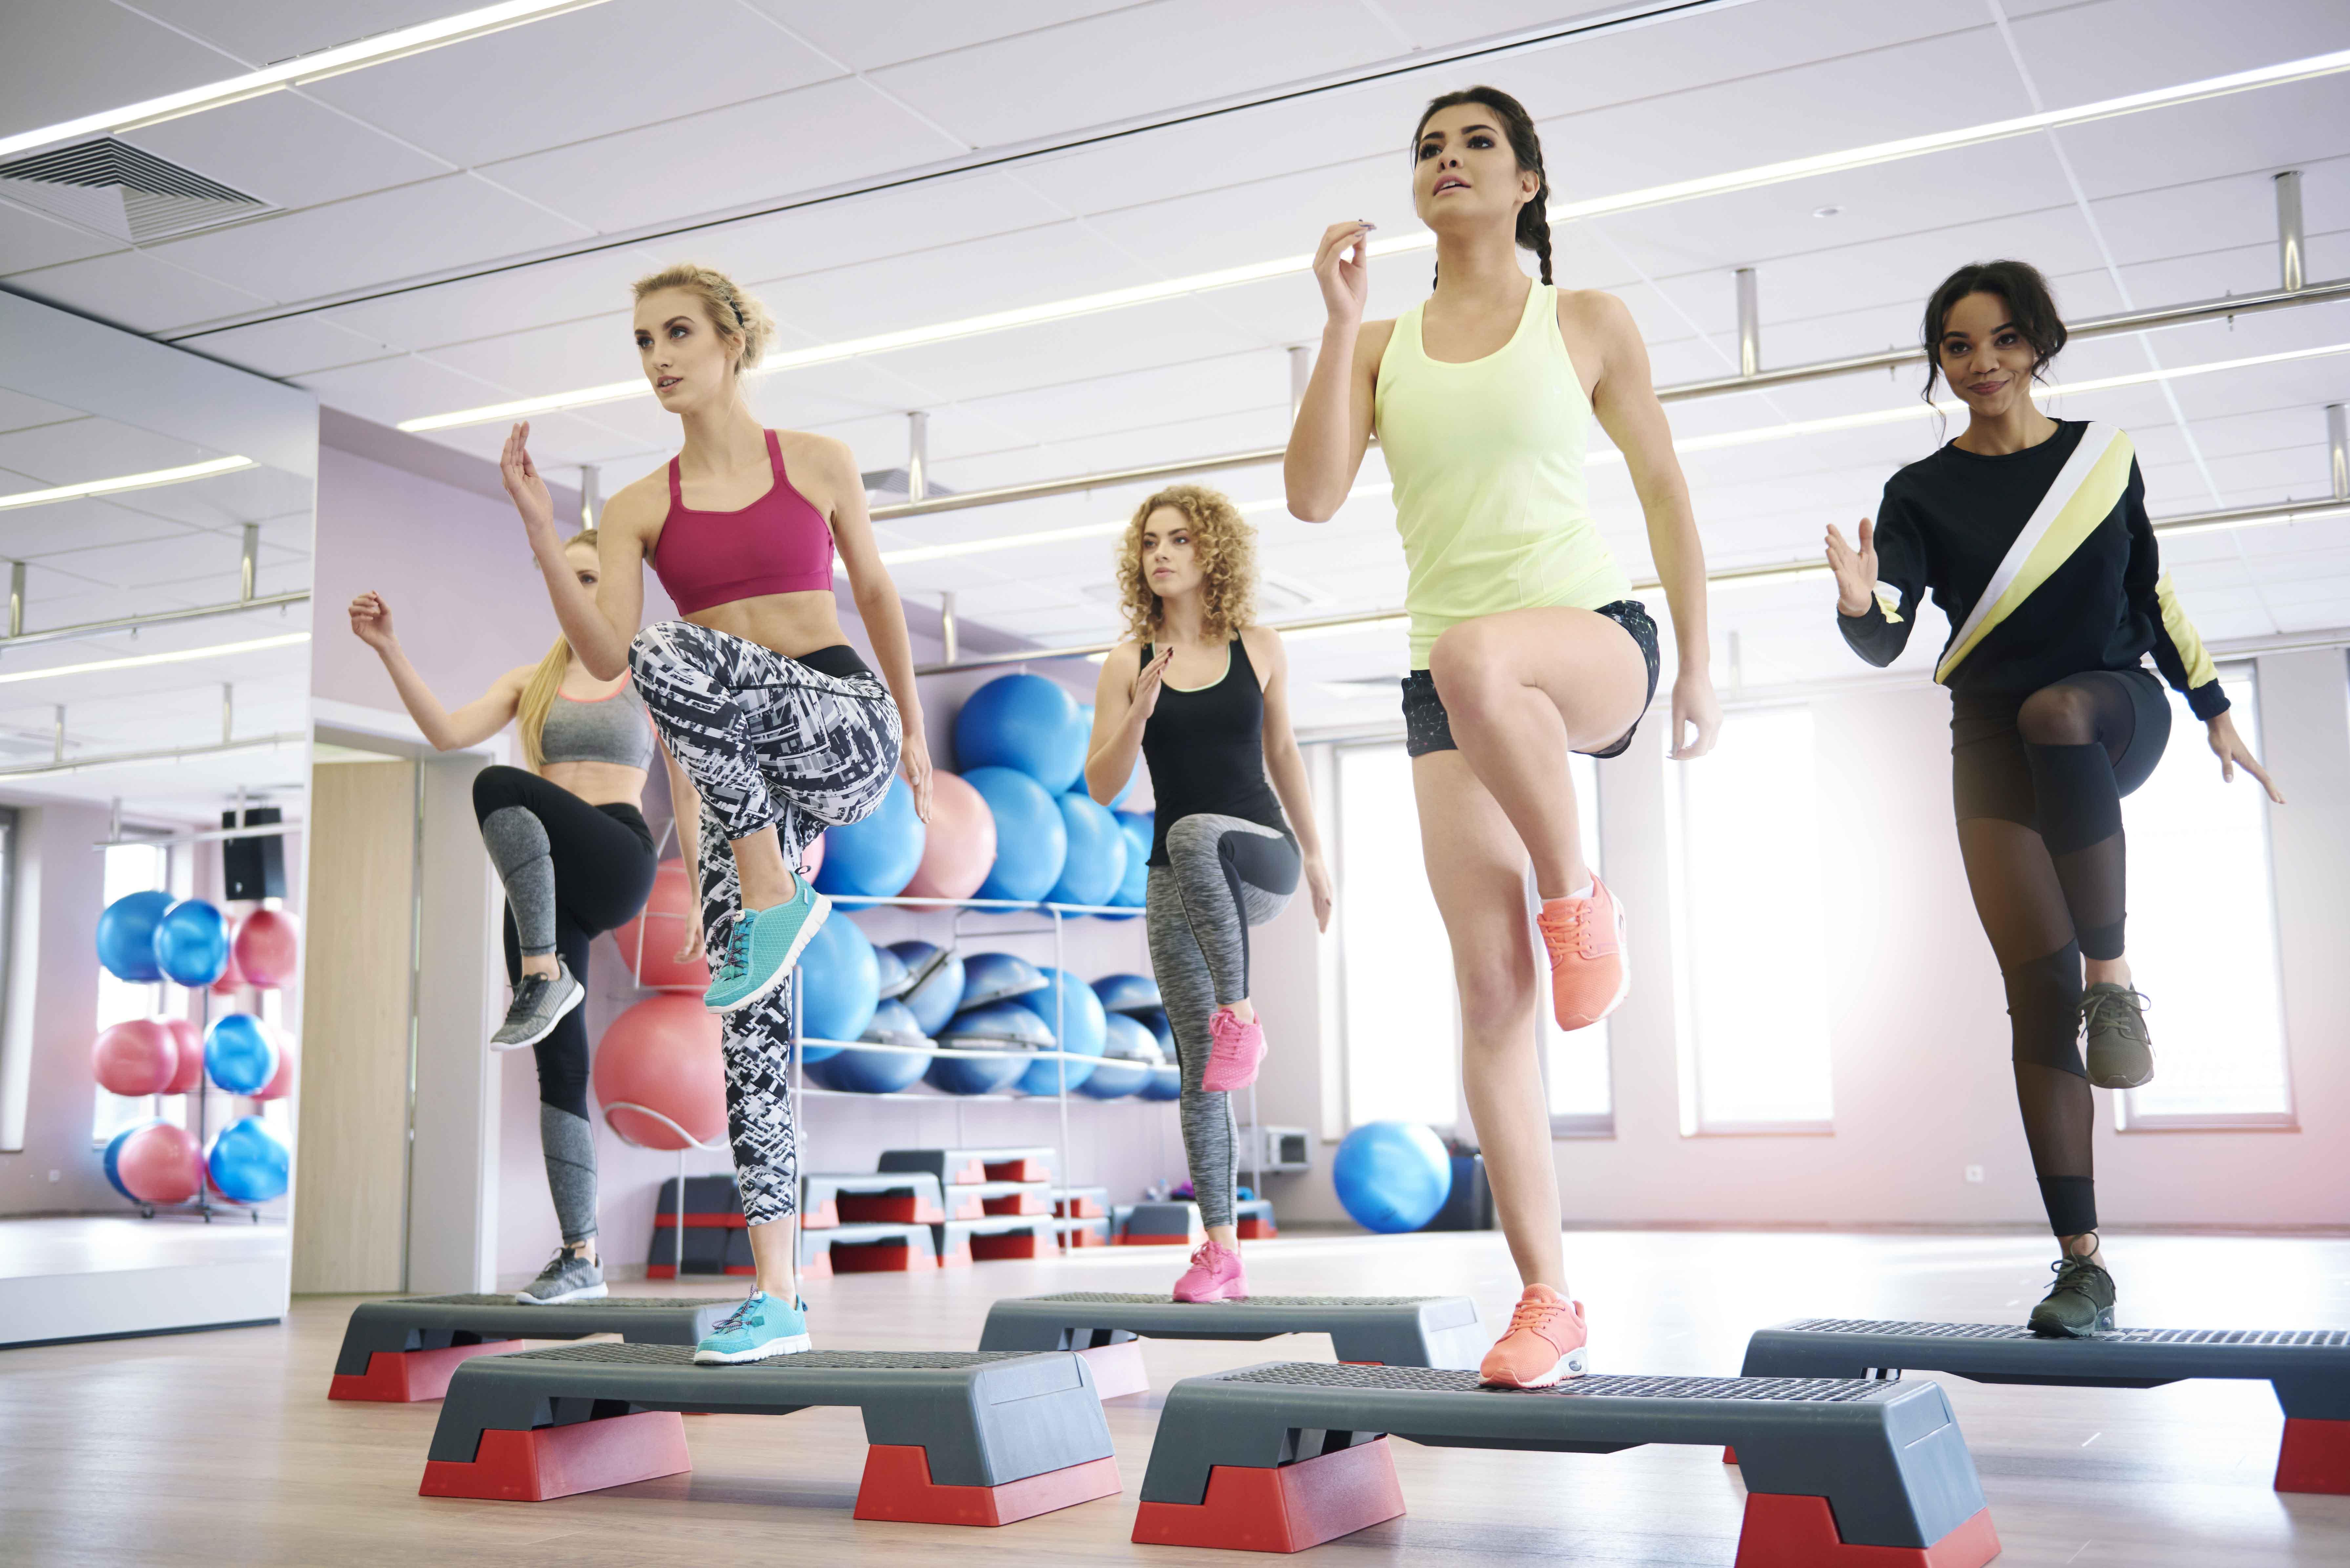 Chica profesora de aerobic dando clase